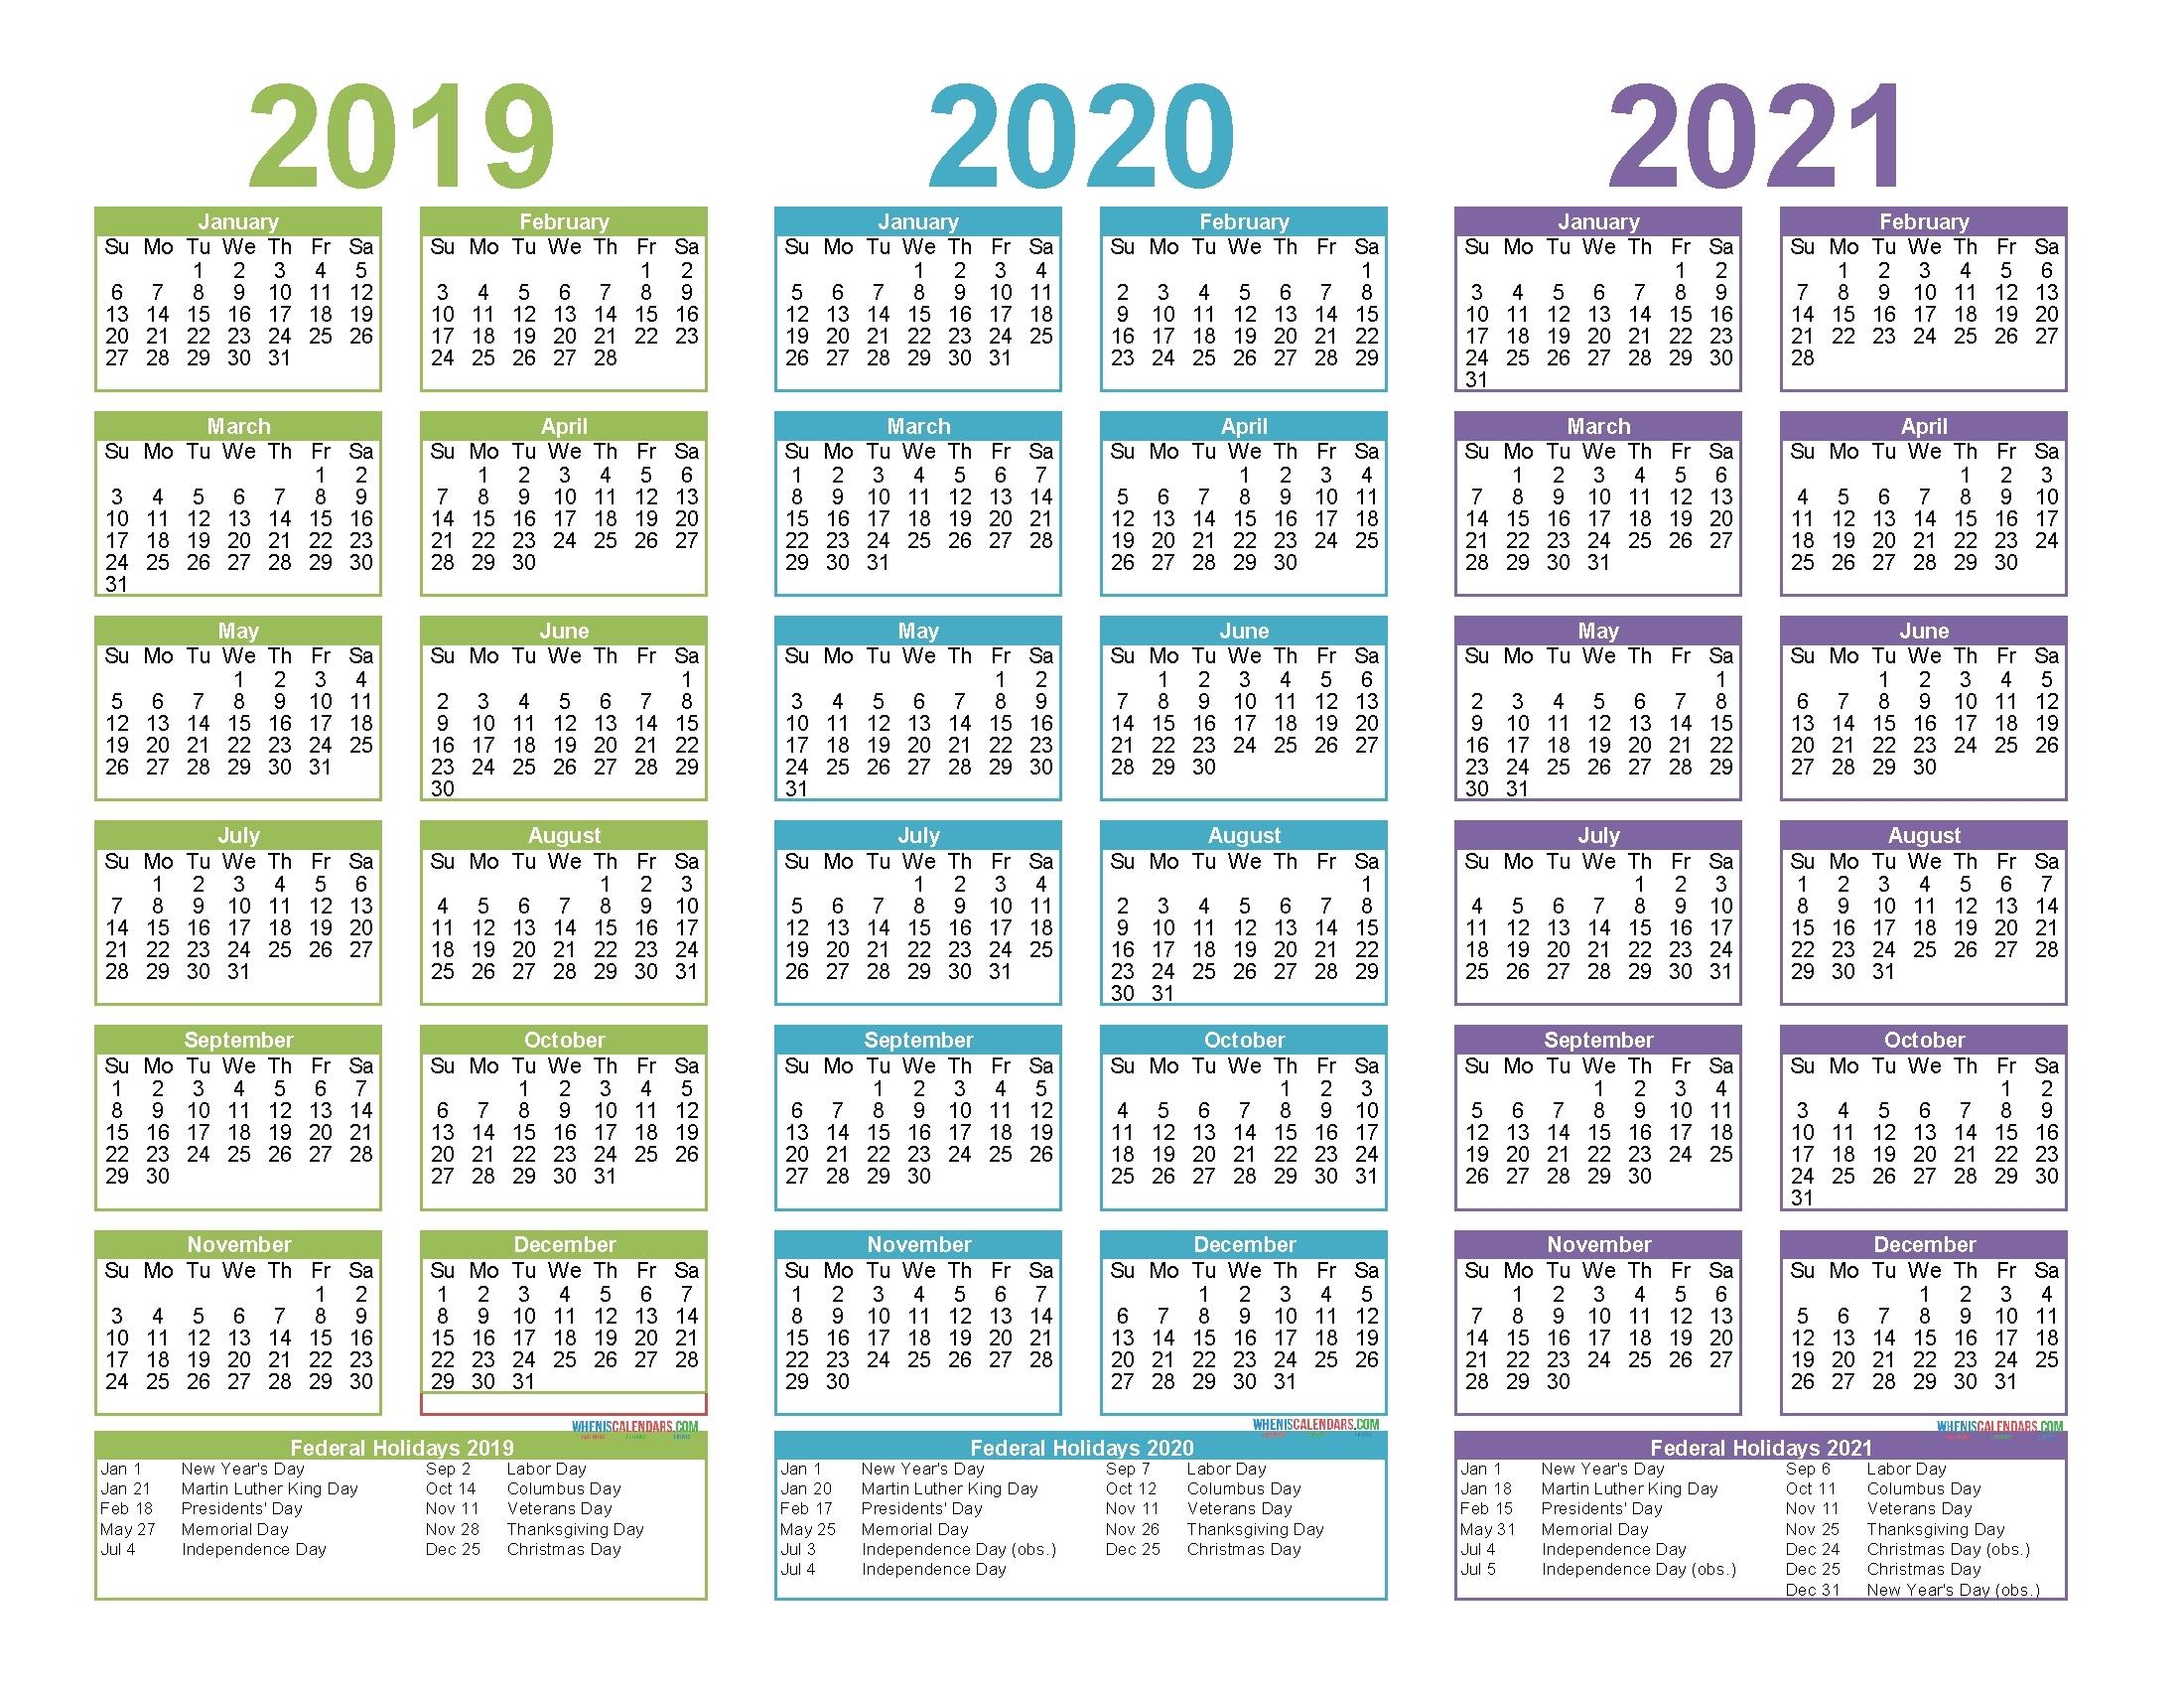 3 Year Calendar Printable 2019 2020 2021 - Calendar